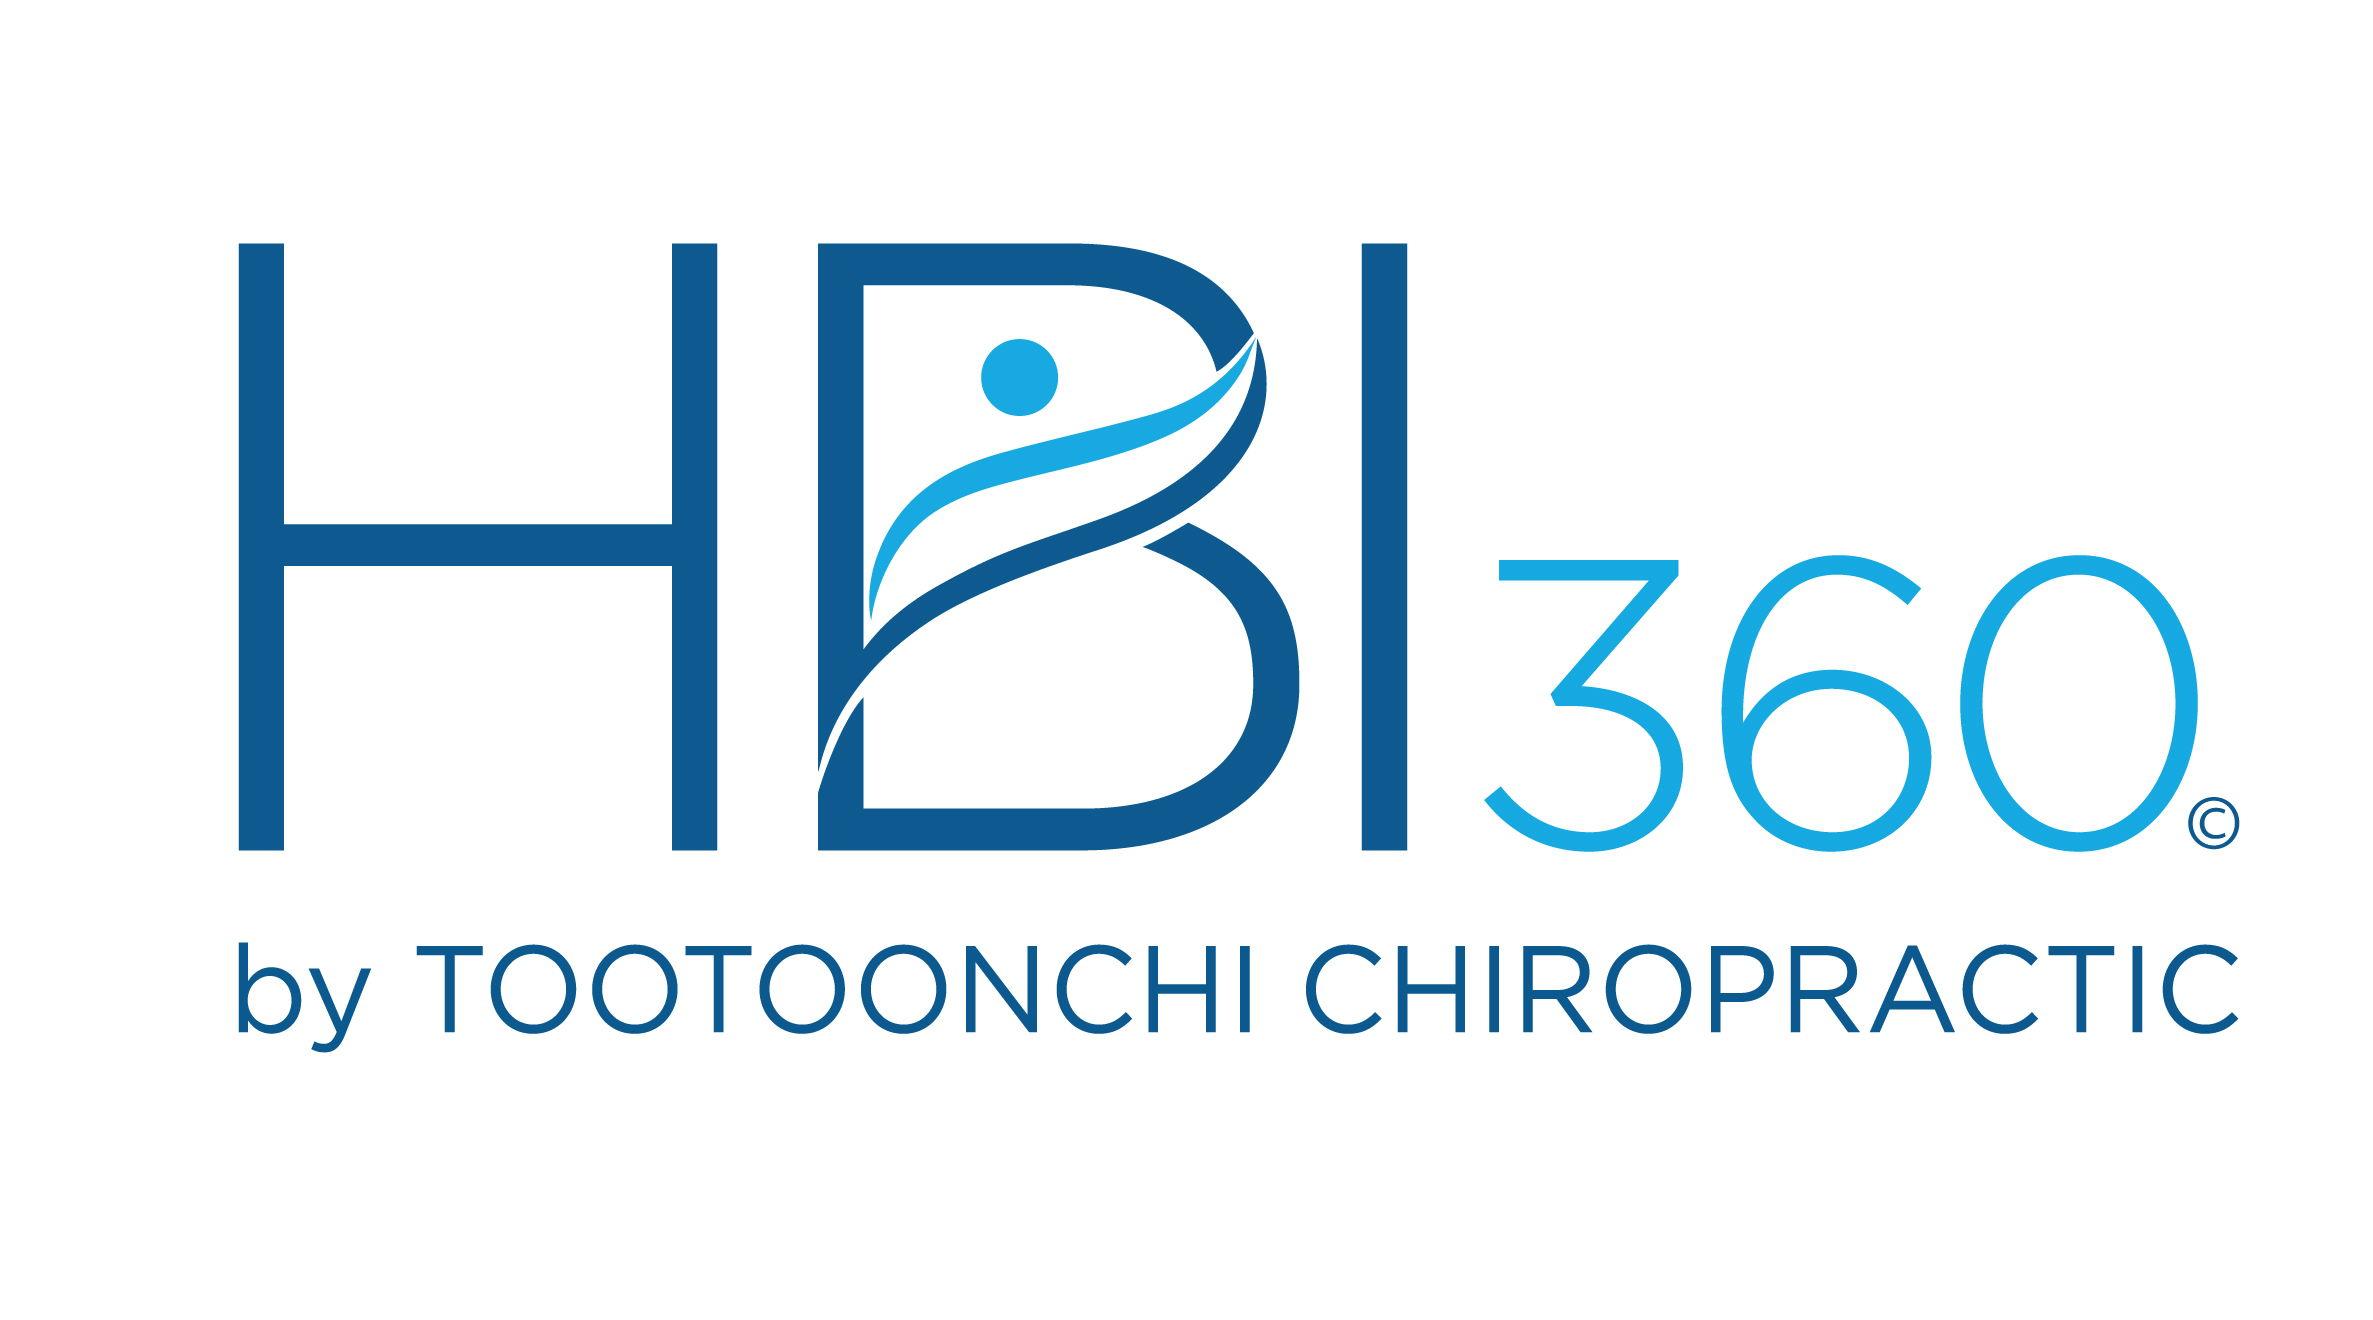 Tootoonchi Chiropractic Inc.